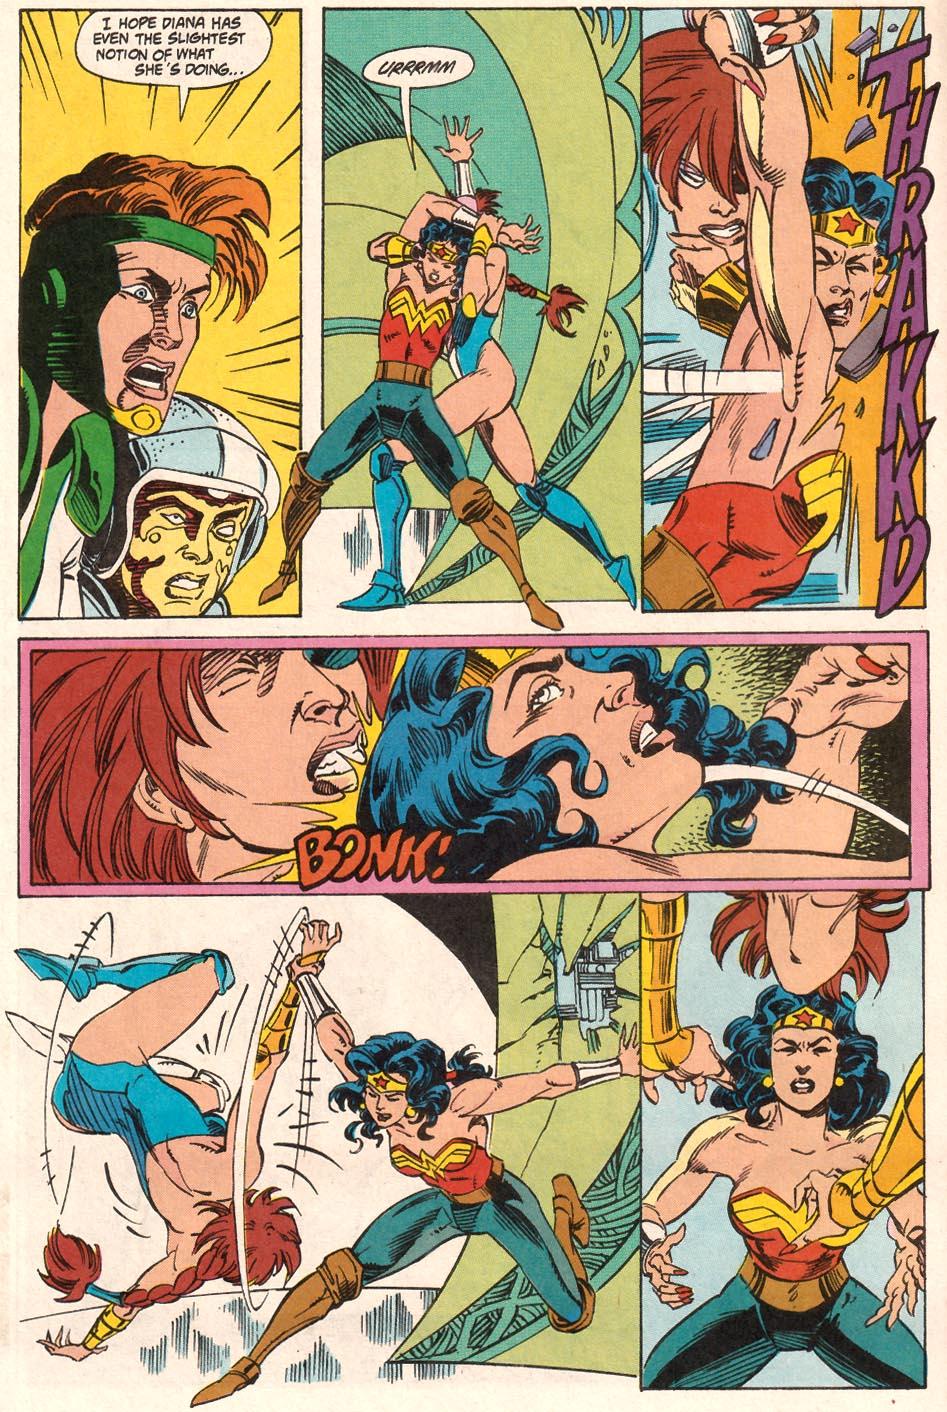 Read online Wonder Woman (1987) comic -  Issue #71 - 11